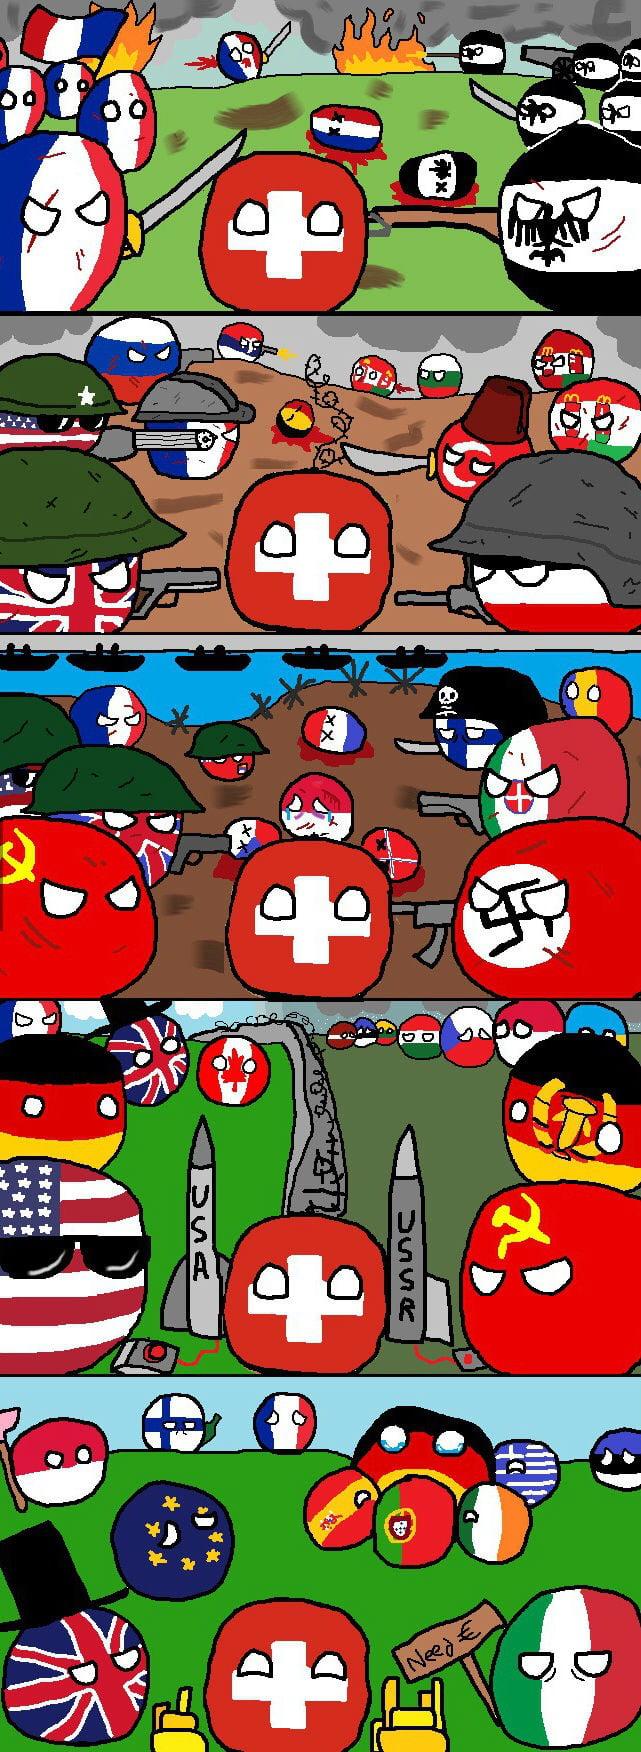 The neutrality of Switzerland